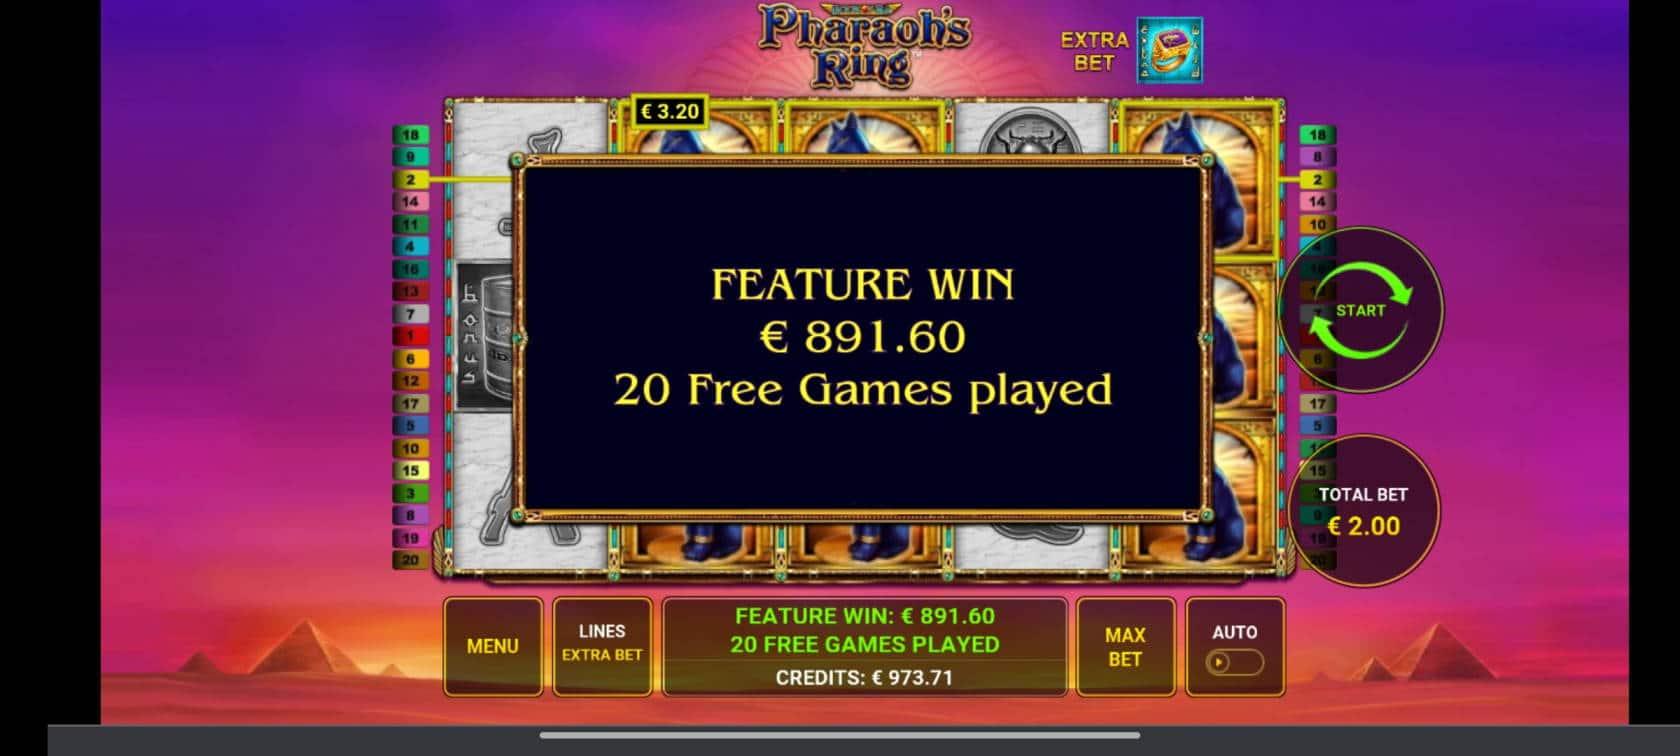 Pharaohs Ring Casino win picture by tiikerililja87 19.6.2021 891.60e 446X